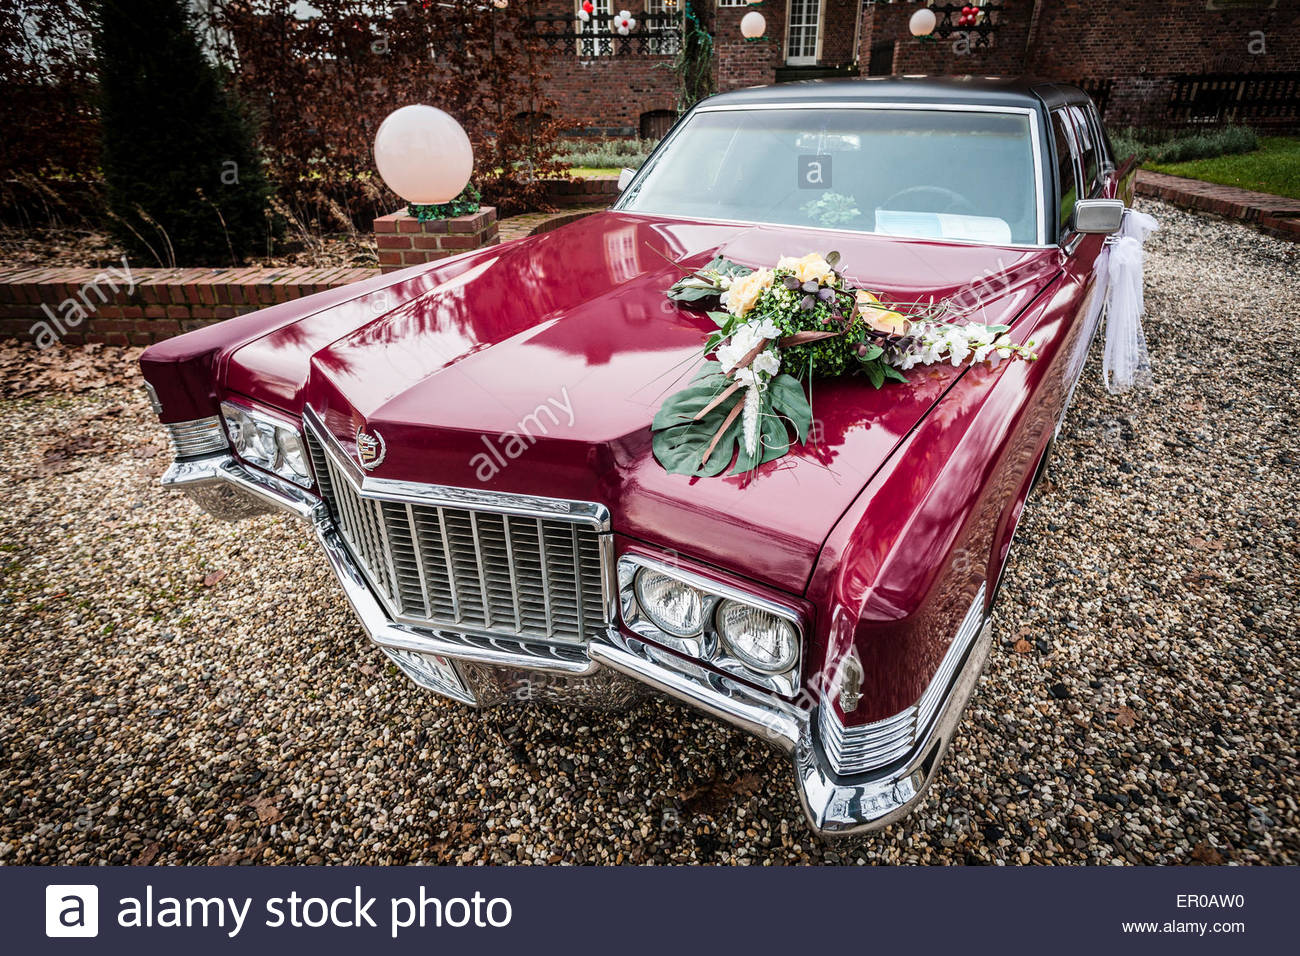 Wedding Car Decoration Stock Photo 82987100 Alamy